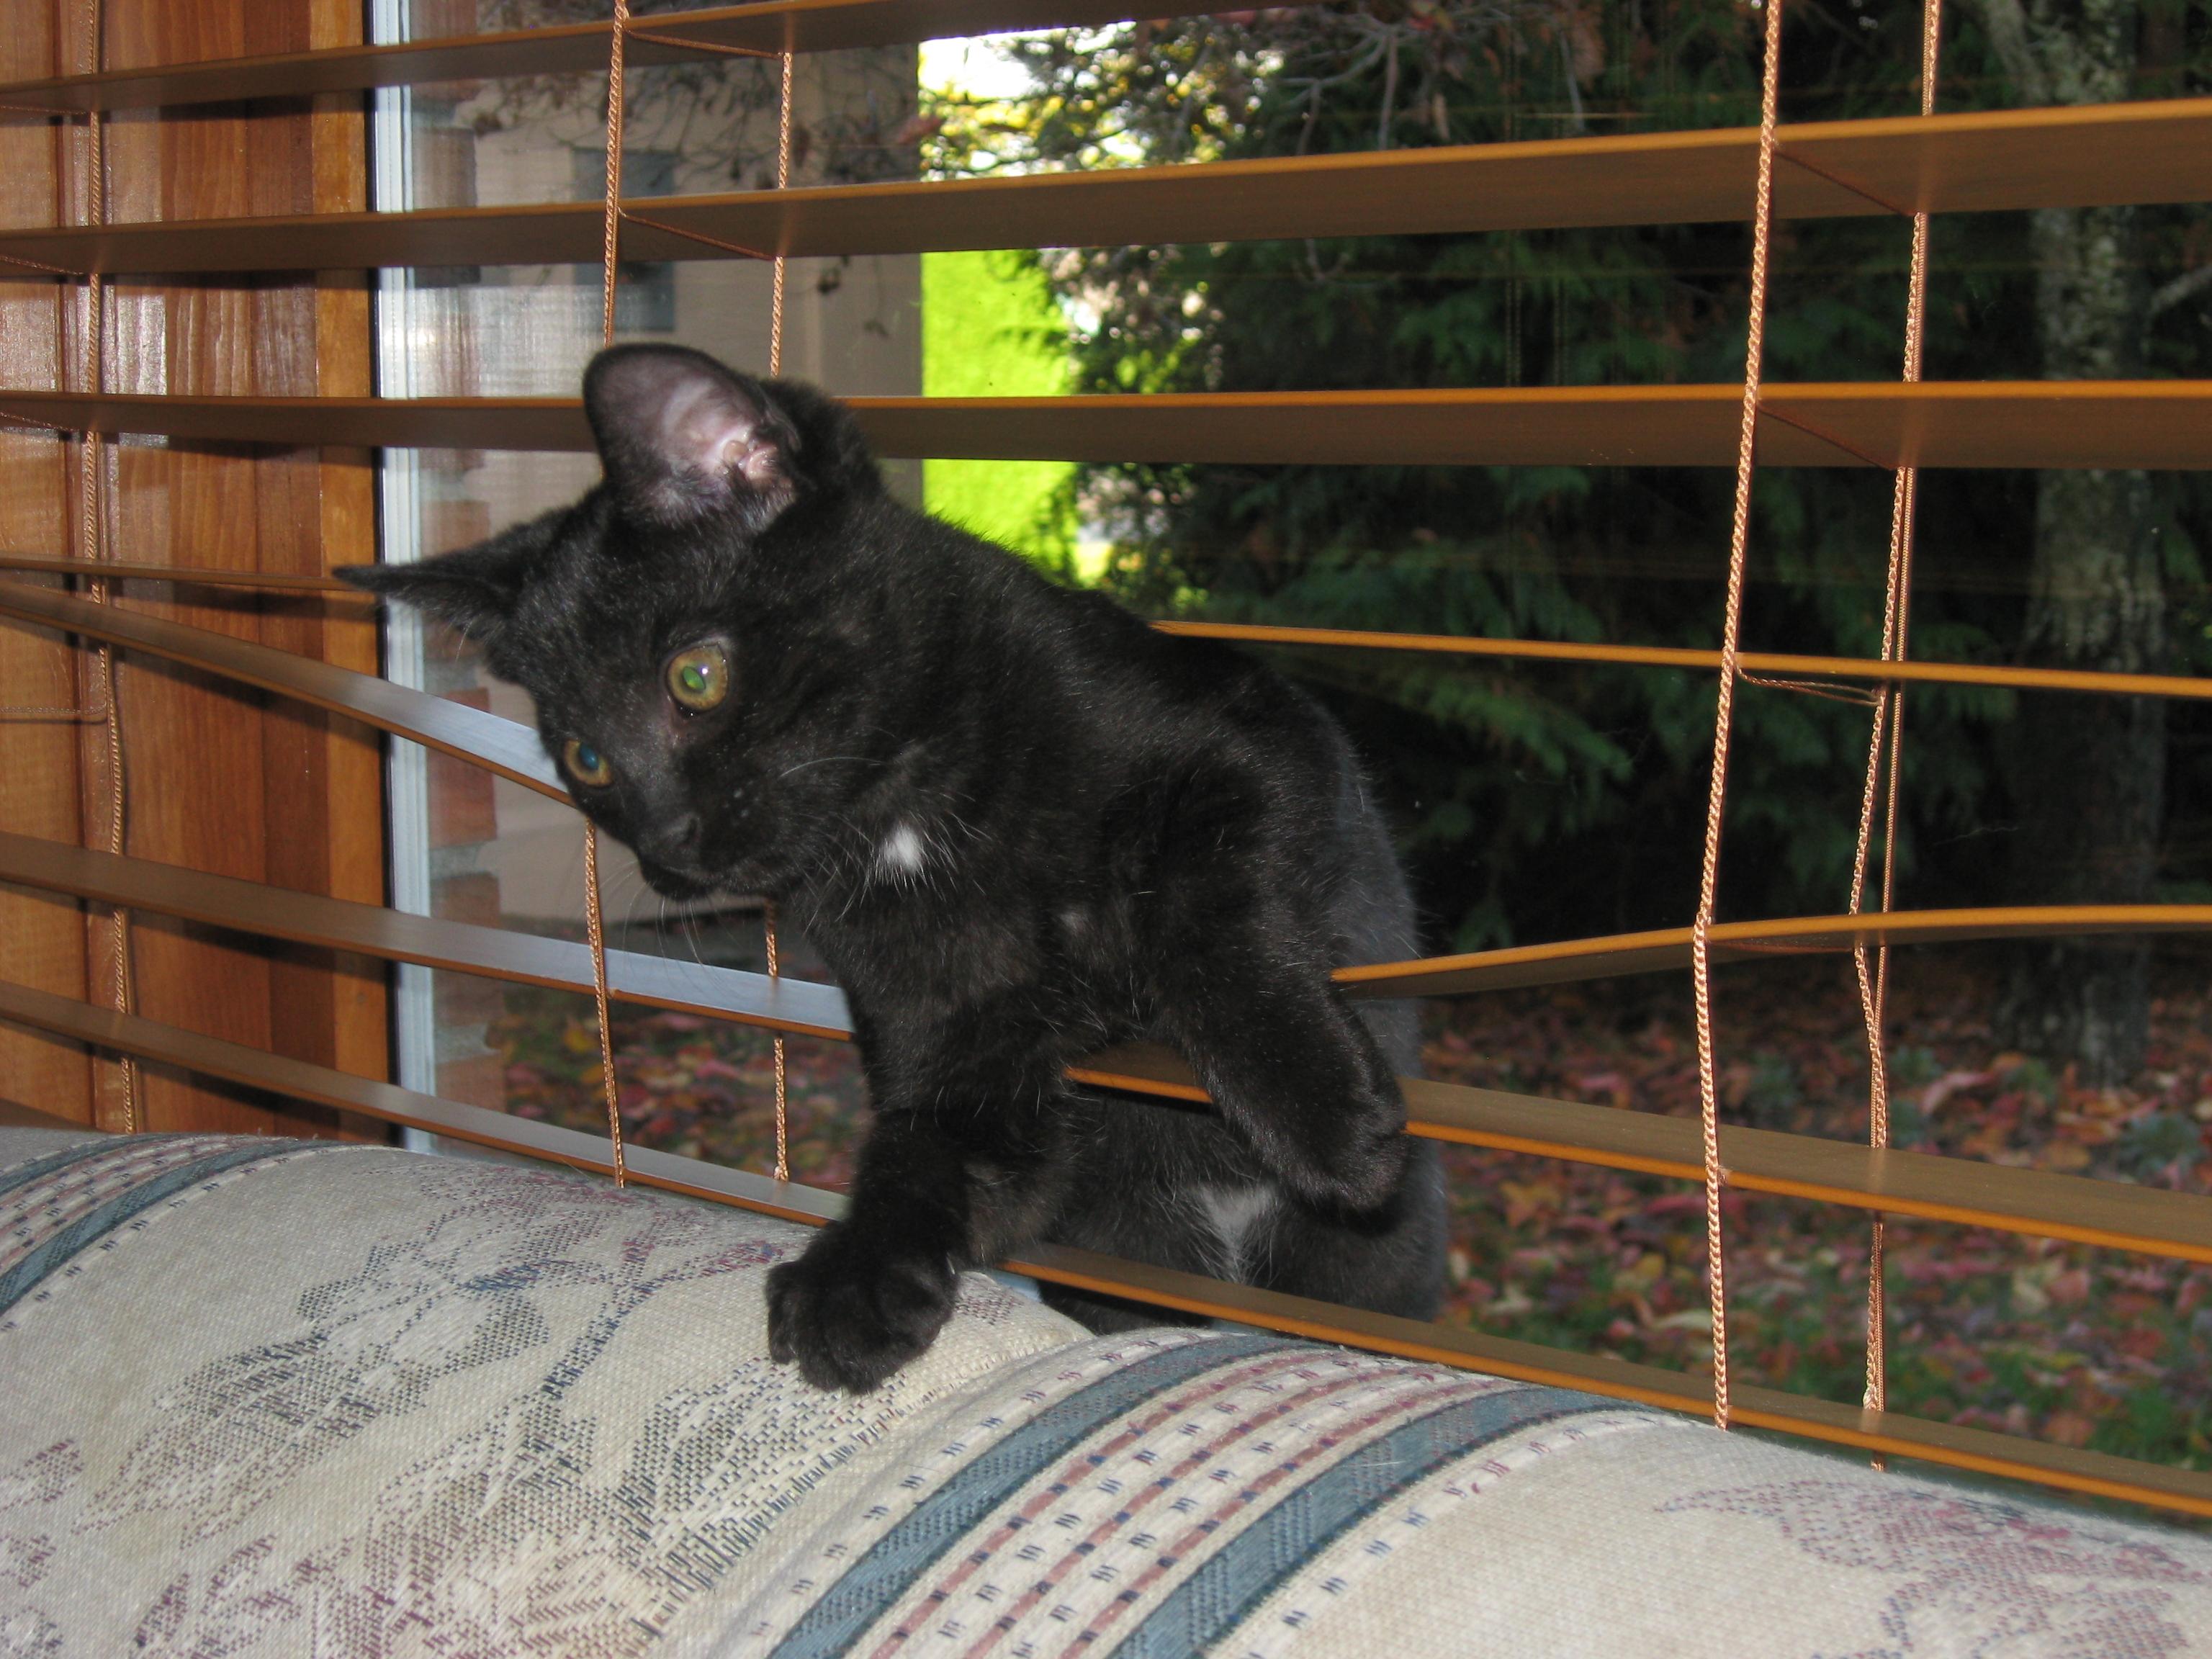 Black Kitten Playing in the Window Blind